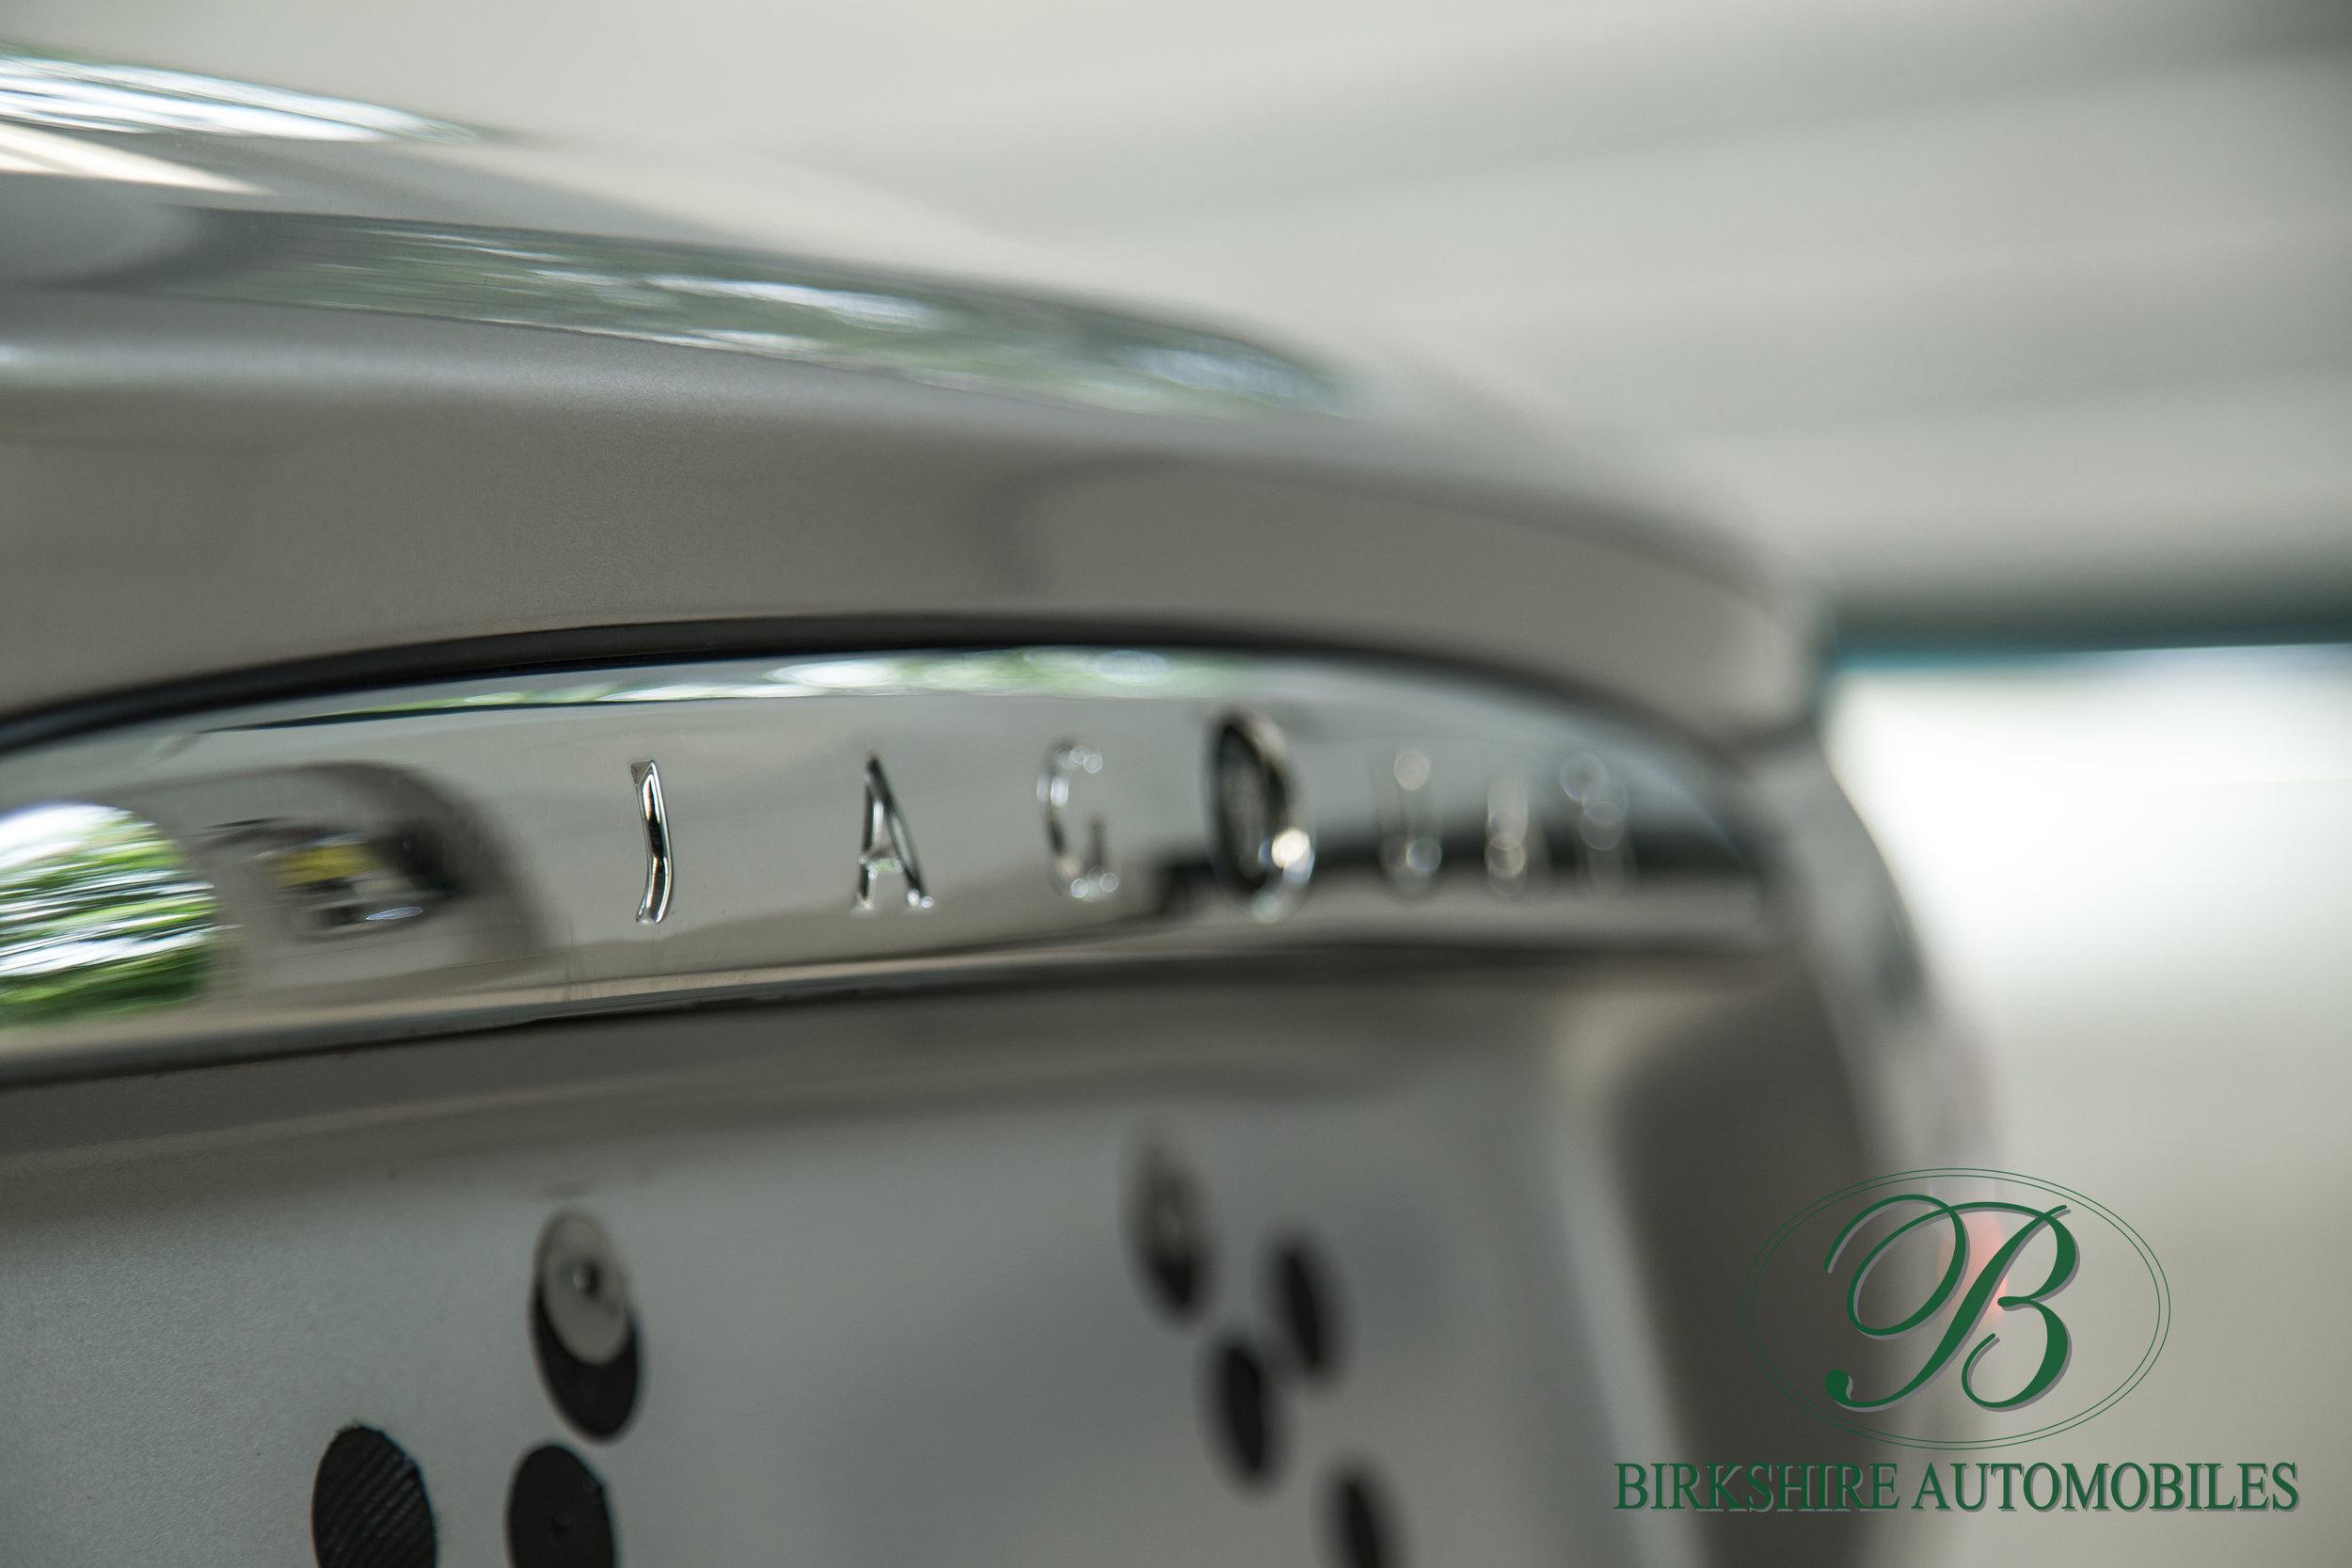 Birkshire Automobiles-254.jpg